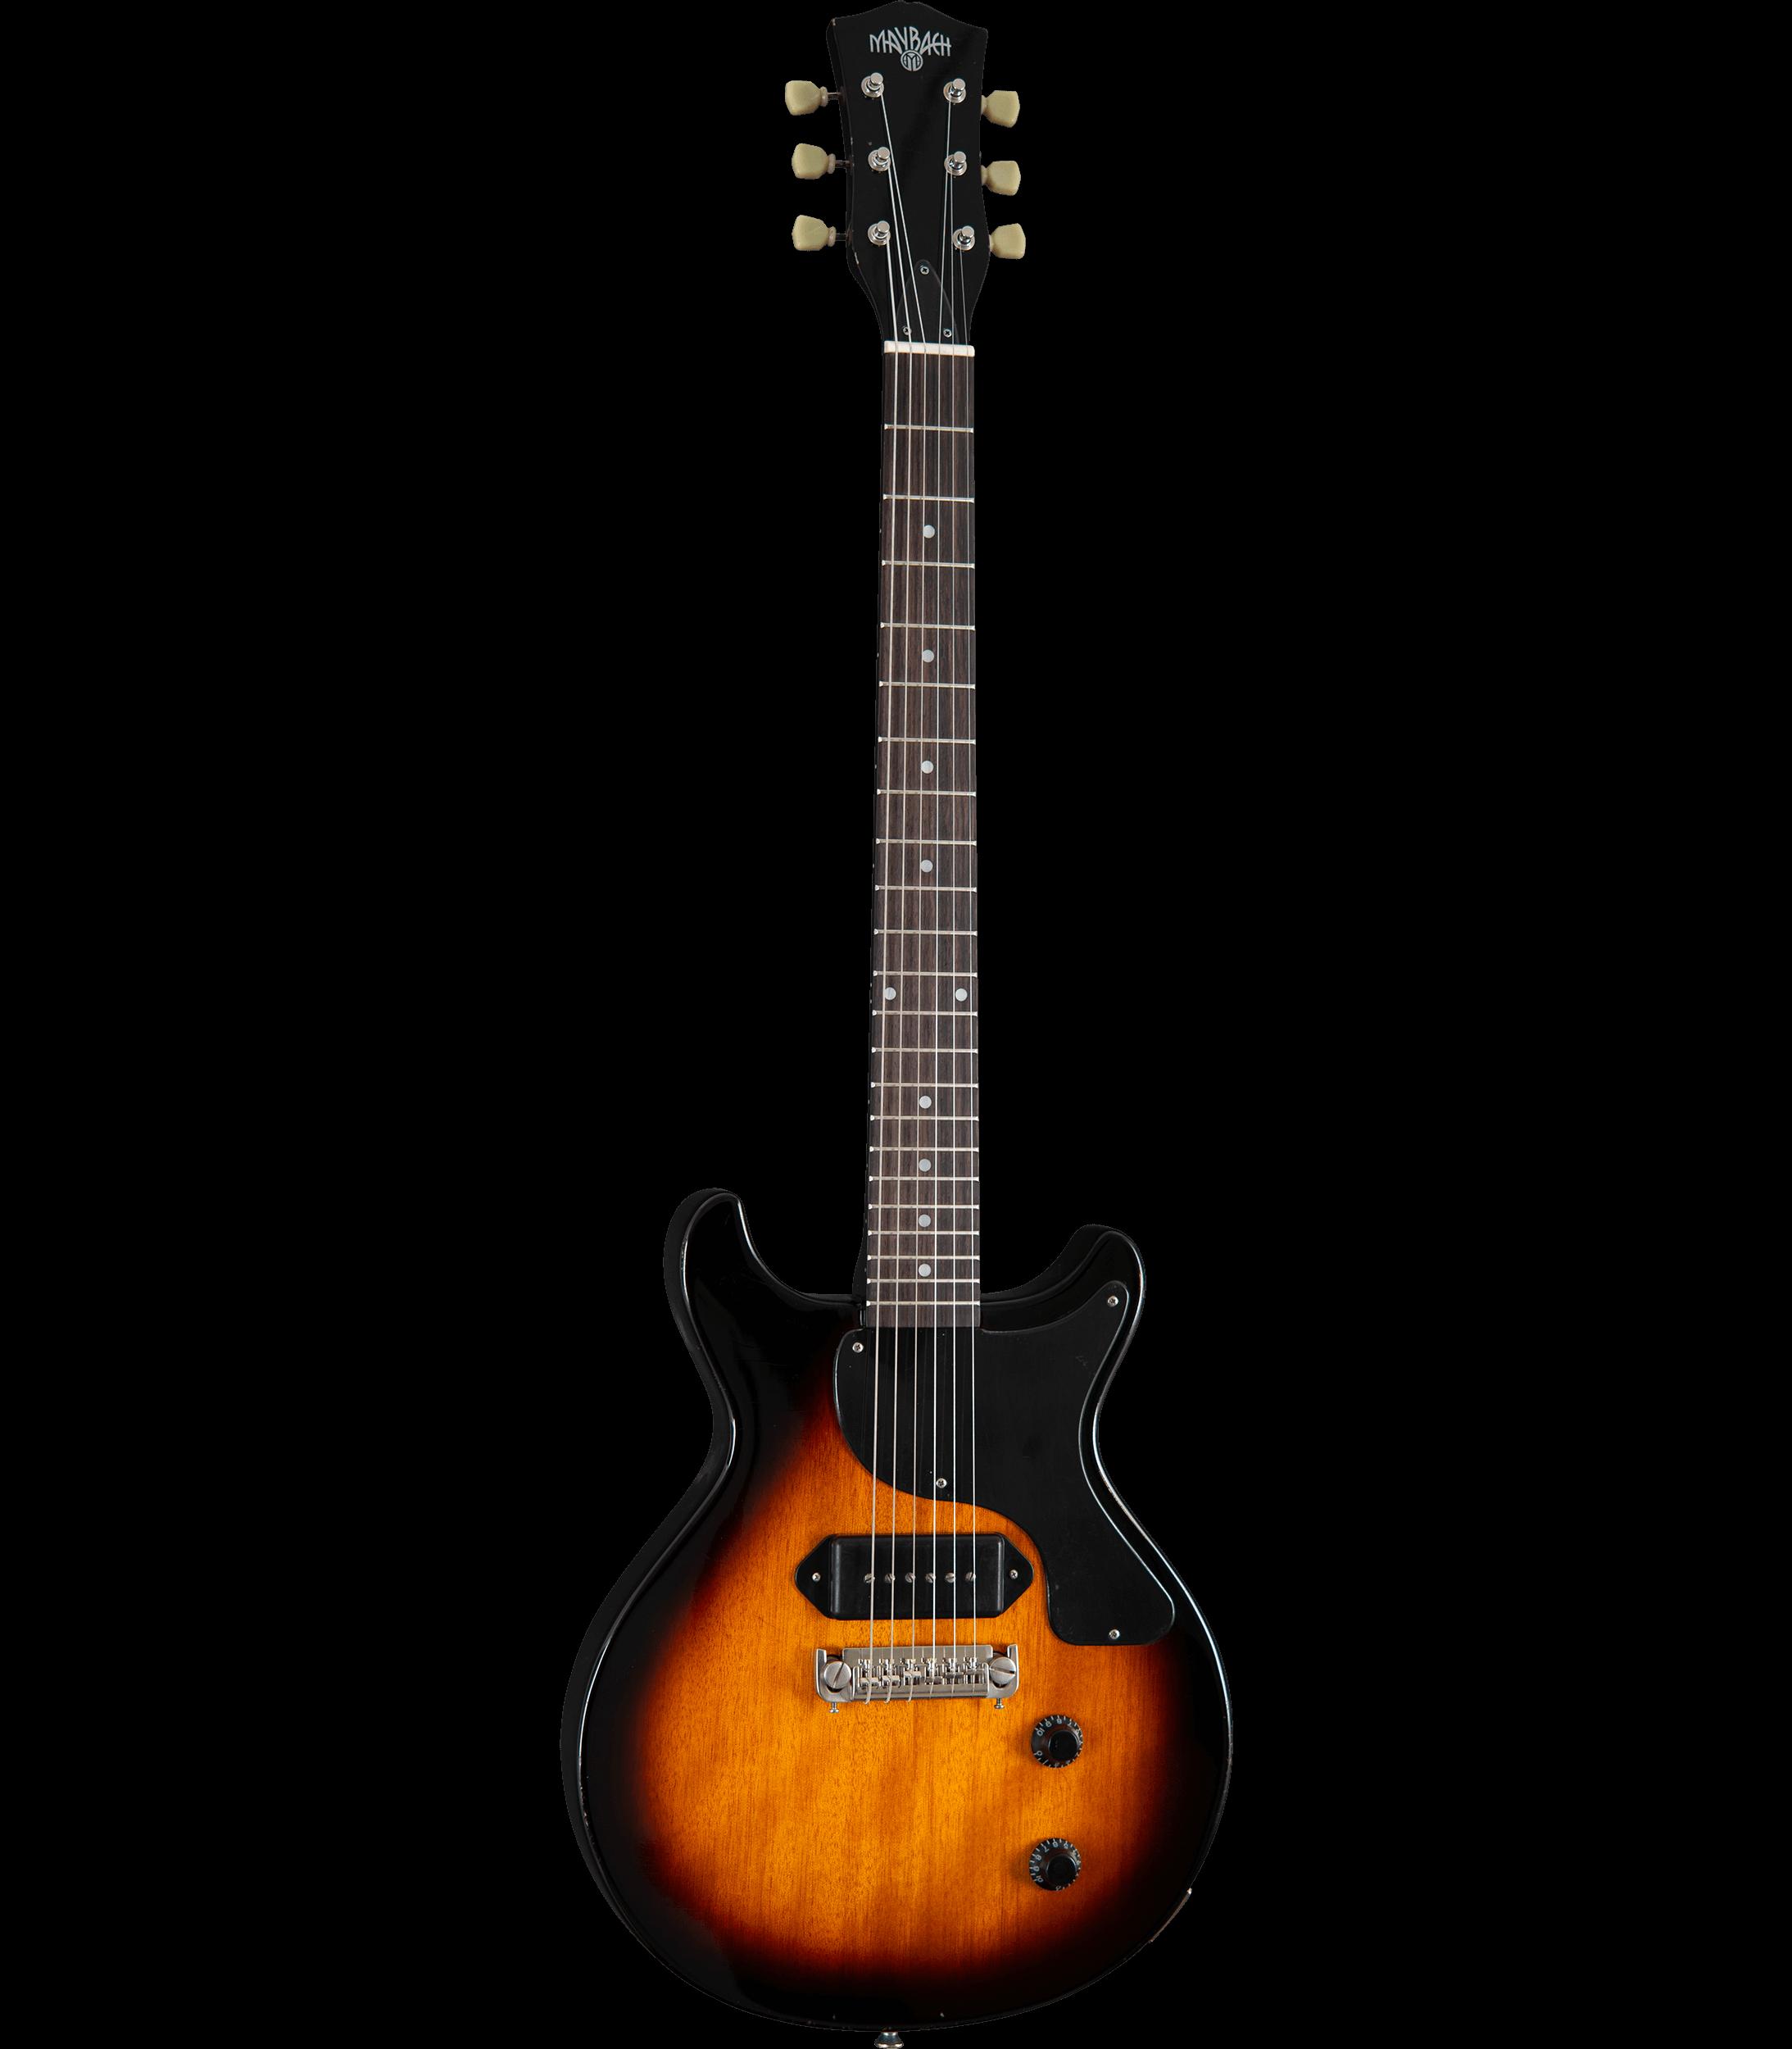 Maybach Lester Jr. Double Cut 2-Tone Sunburst